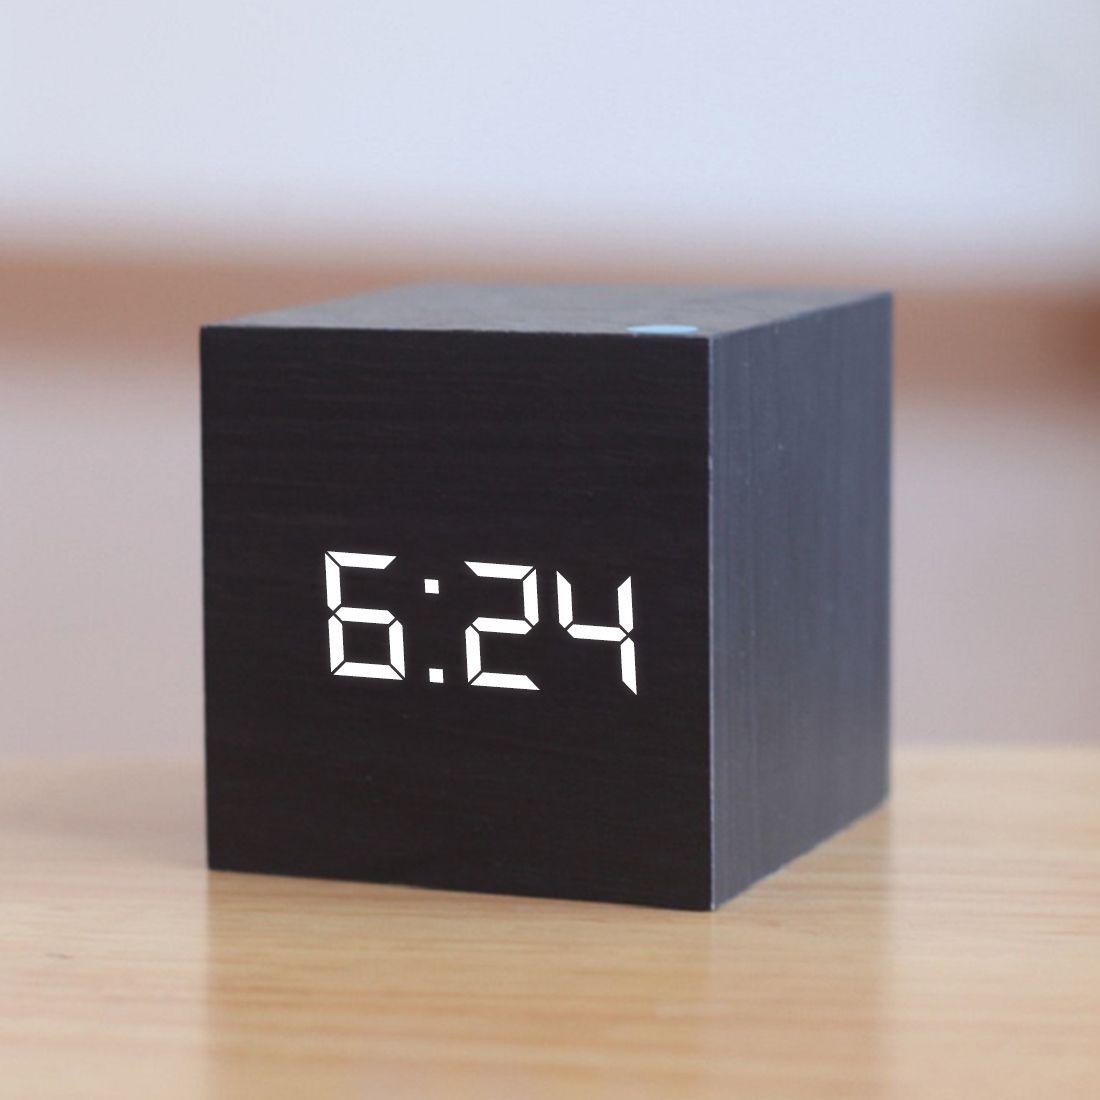 New Qualified Digital Wooden LED Alarm Clock Wood Retro Glow Clock Desktop Table Decor Voice Control Snooze Function Desk Tools LJ200827